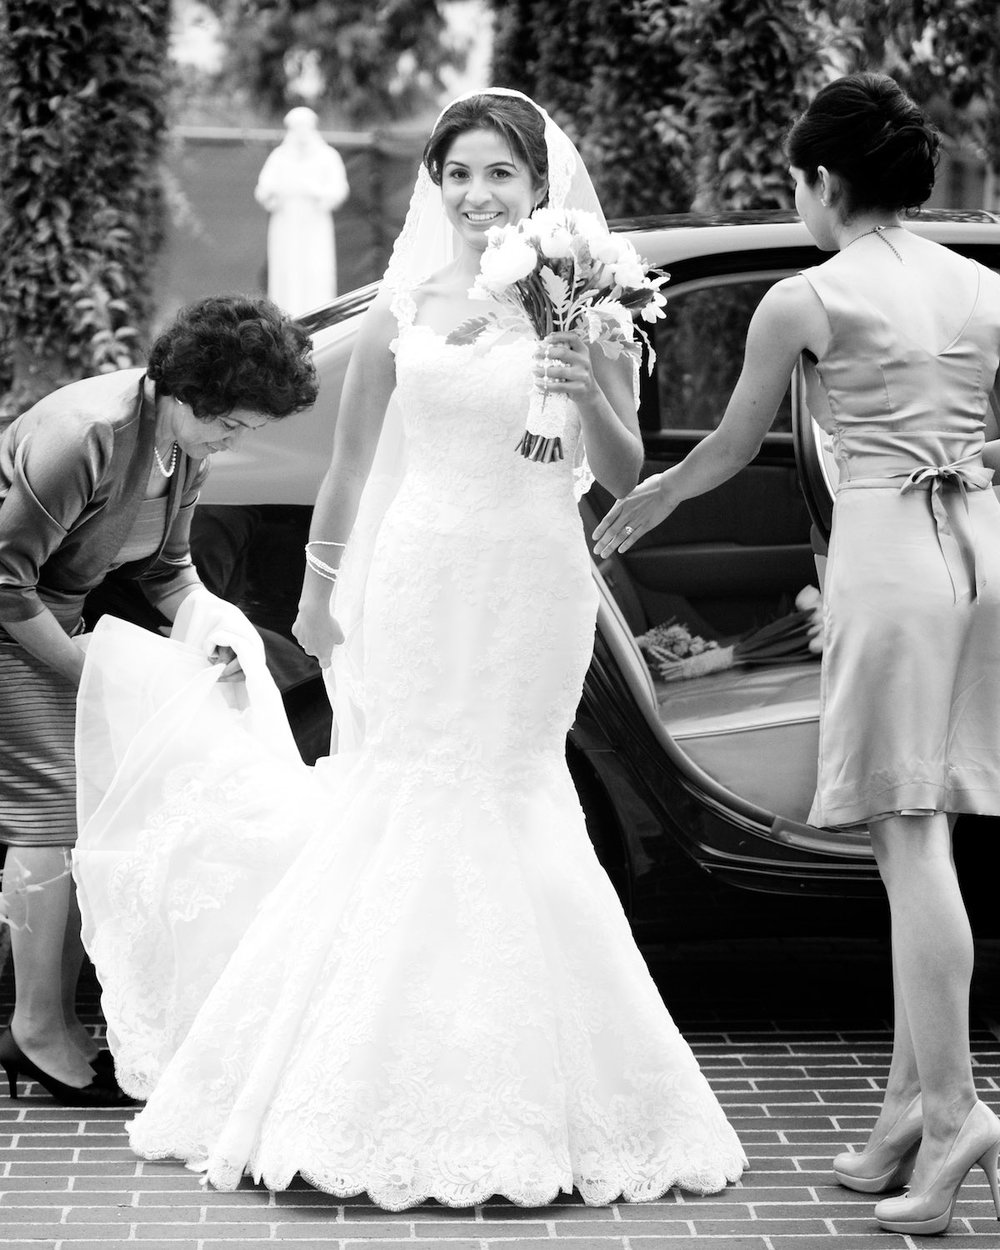 irvine-wedding-michal-pfeil-06.jpg